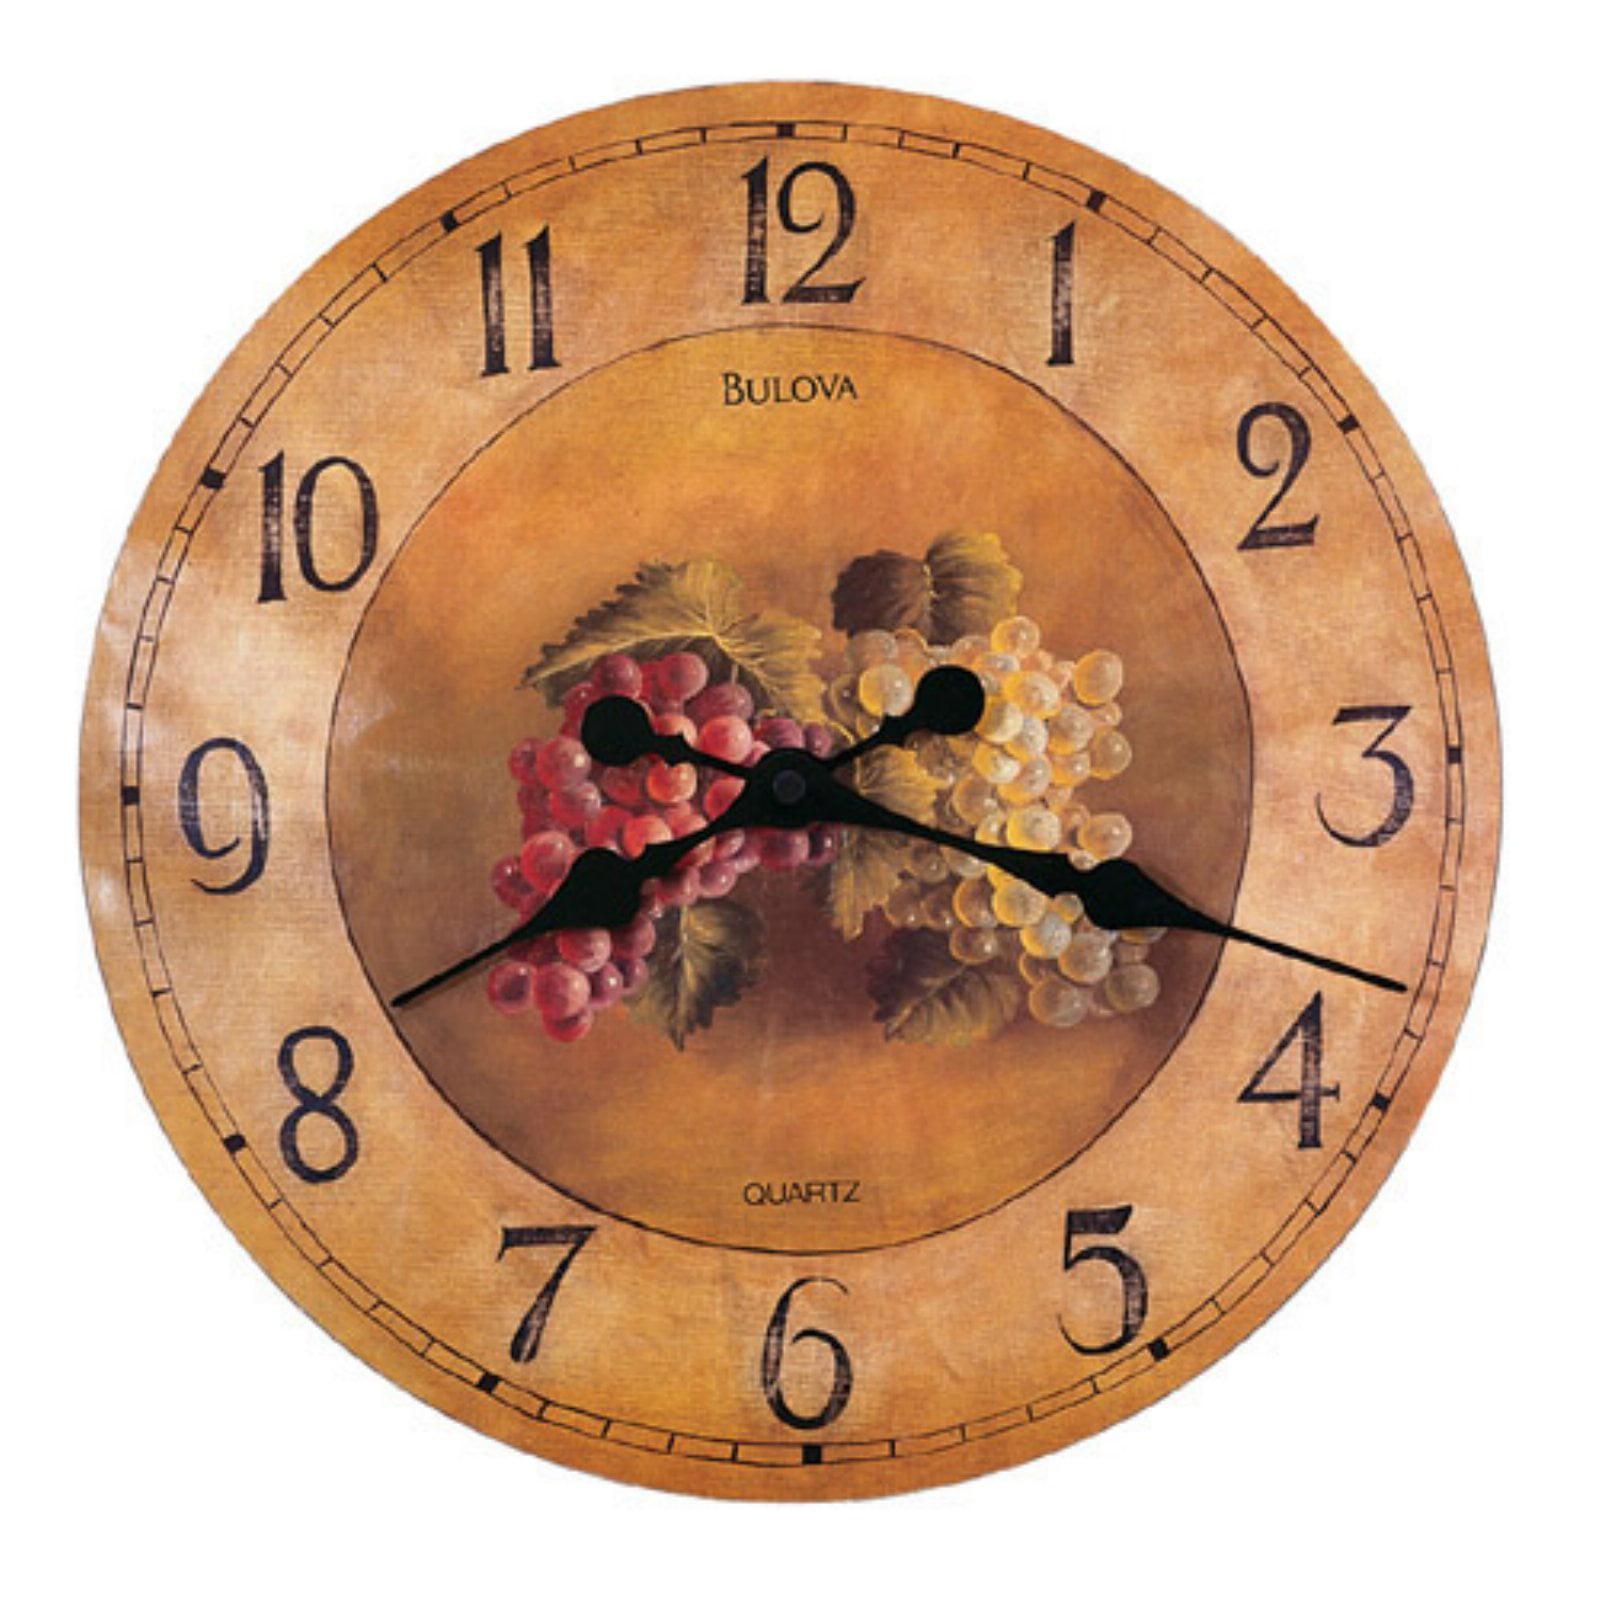 Whittingham 18 Inch Wall Clock By Bulova Walmart Com Walmart Com